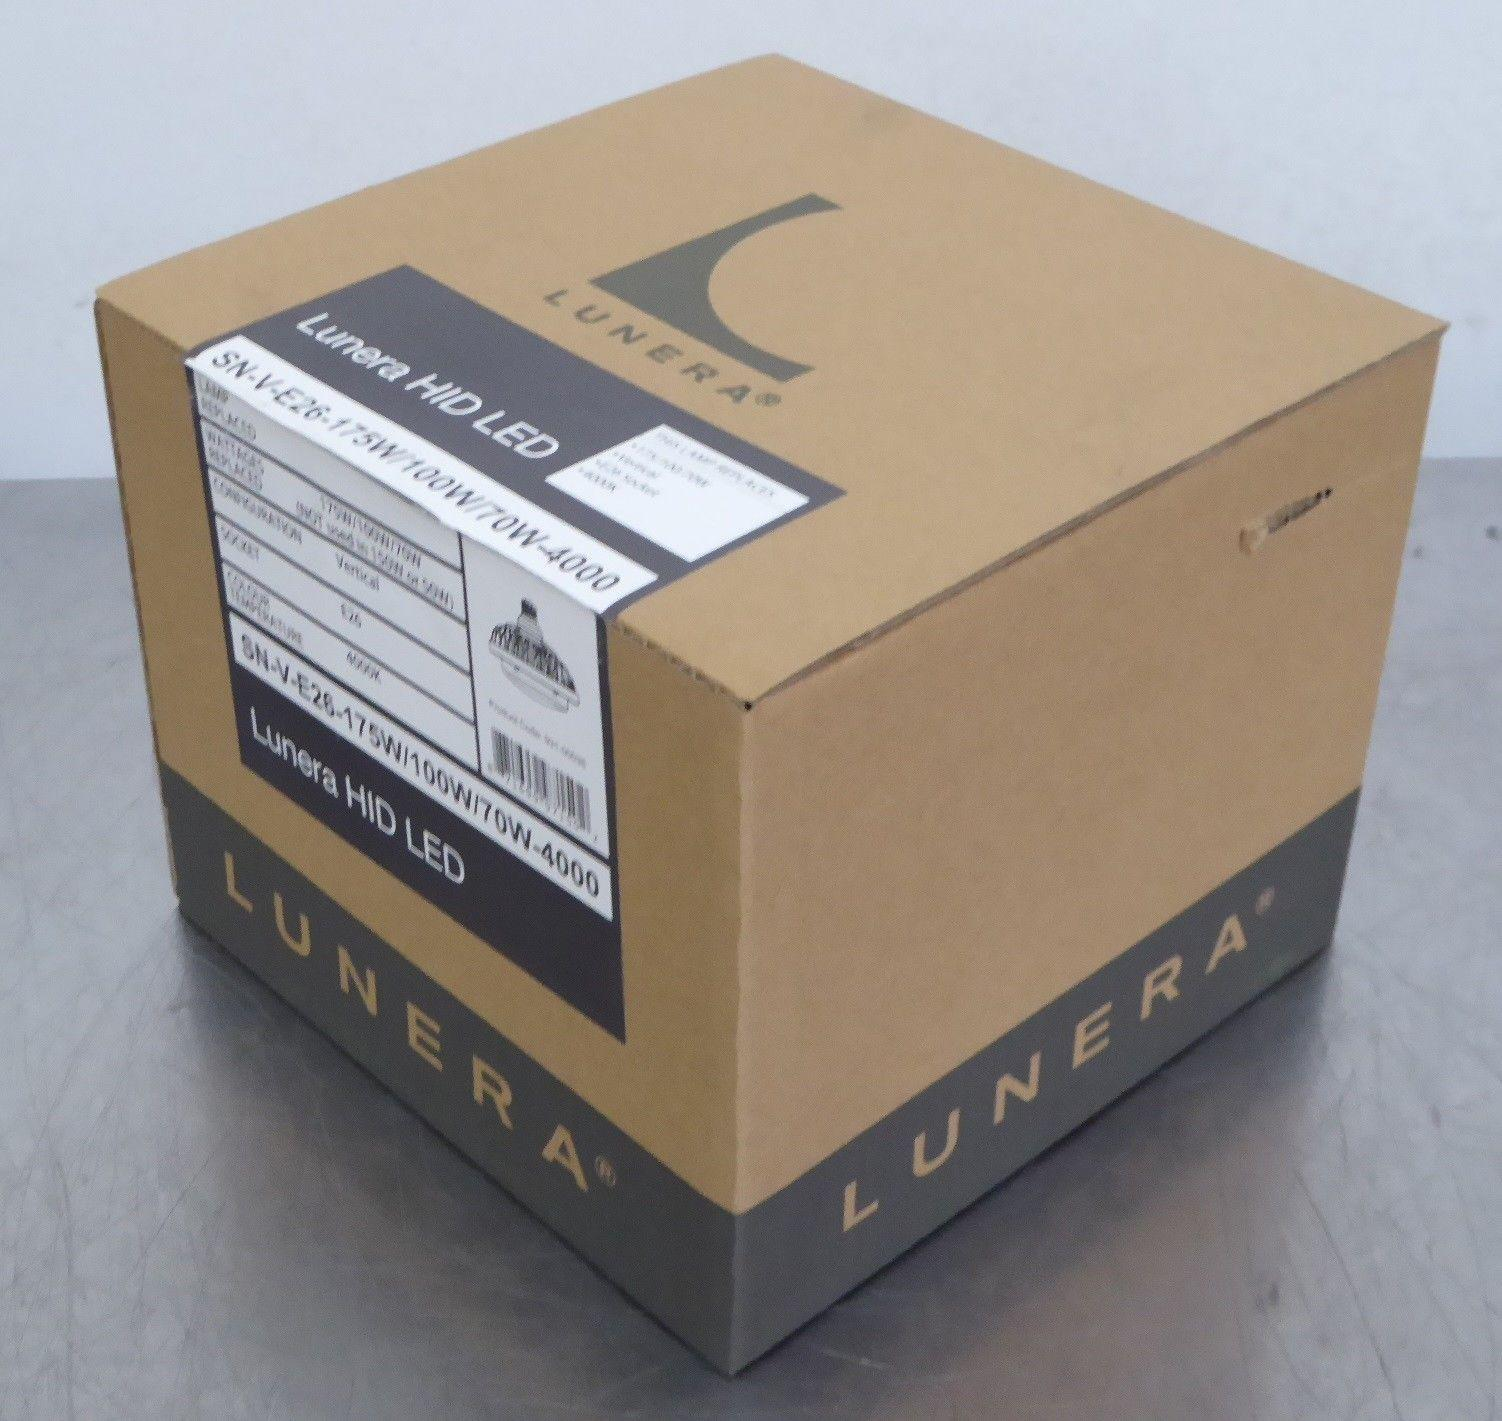 TB Lunera Susan HID LED SN-V-E26-175W/100W/70W-4000 Lamp E26 Socket 4000K